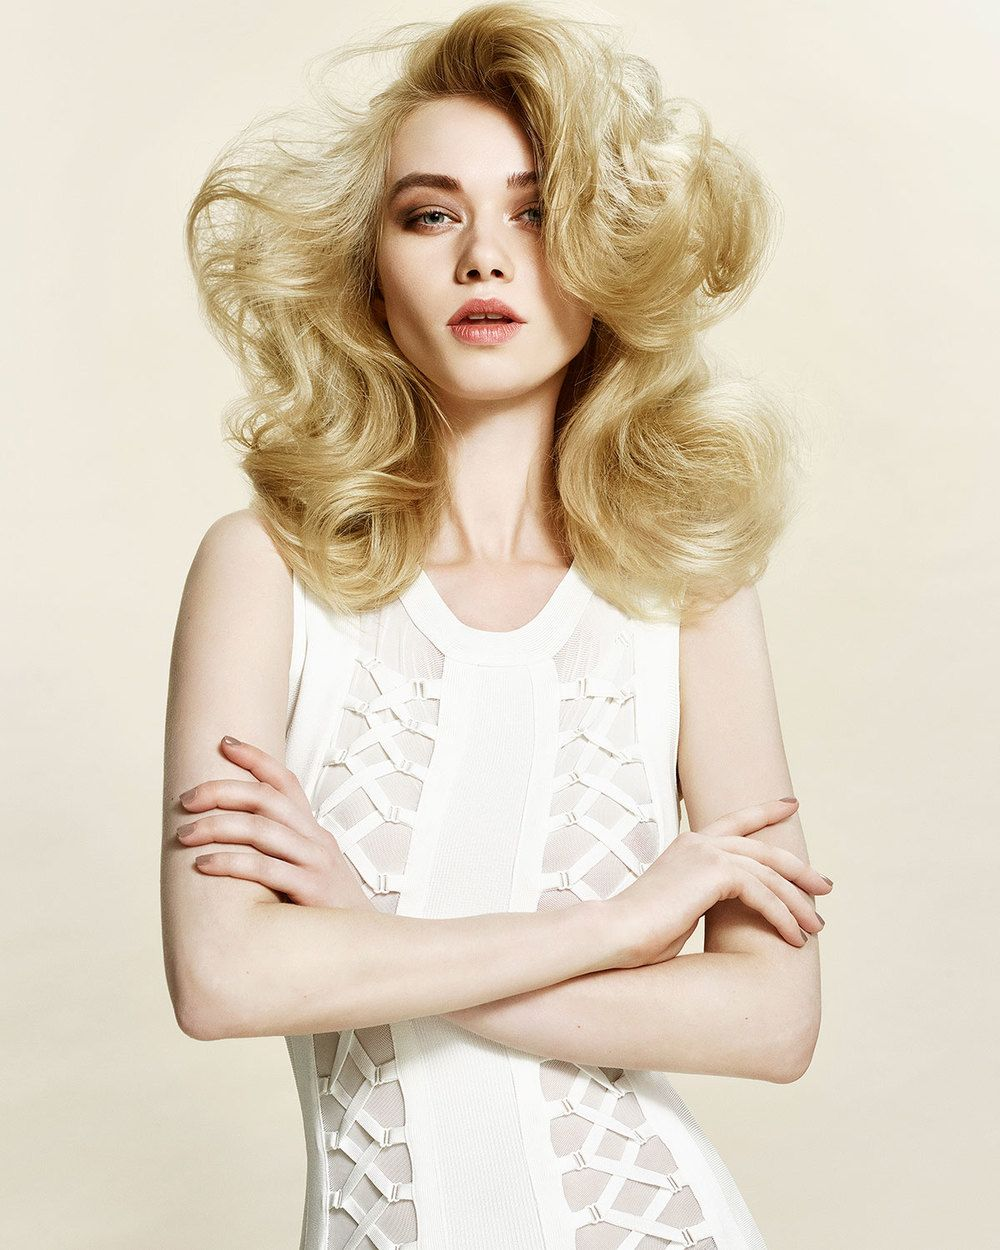 Beauty, Fashion Beauty, Hair Beauty